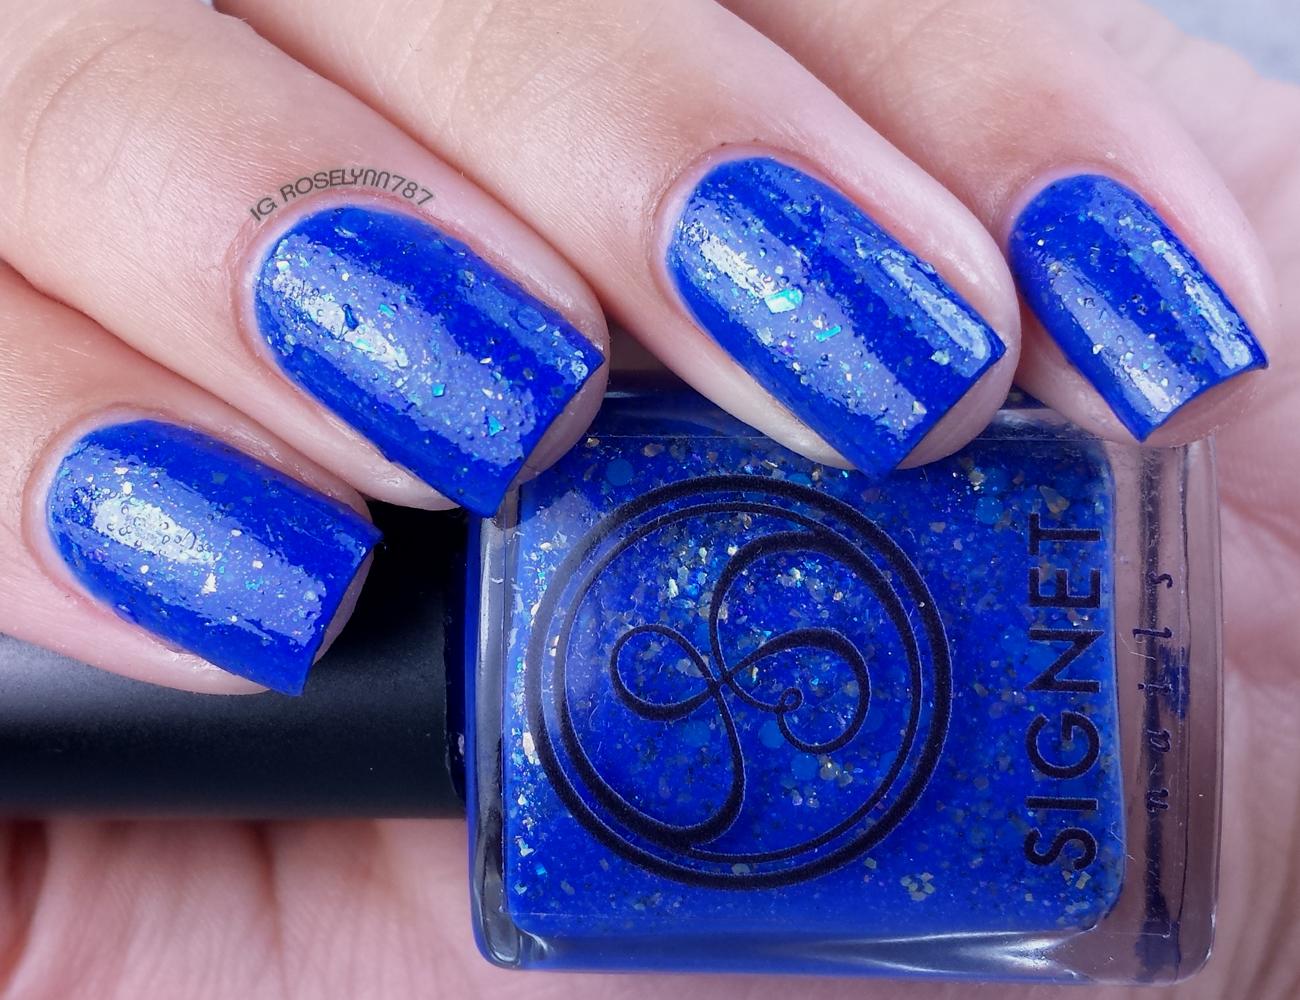 Signet Nails - Lapis Lazuli